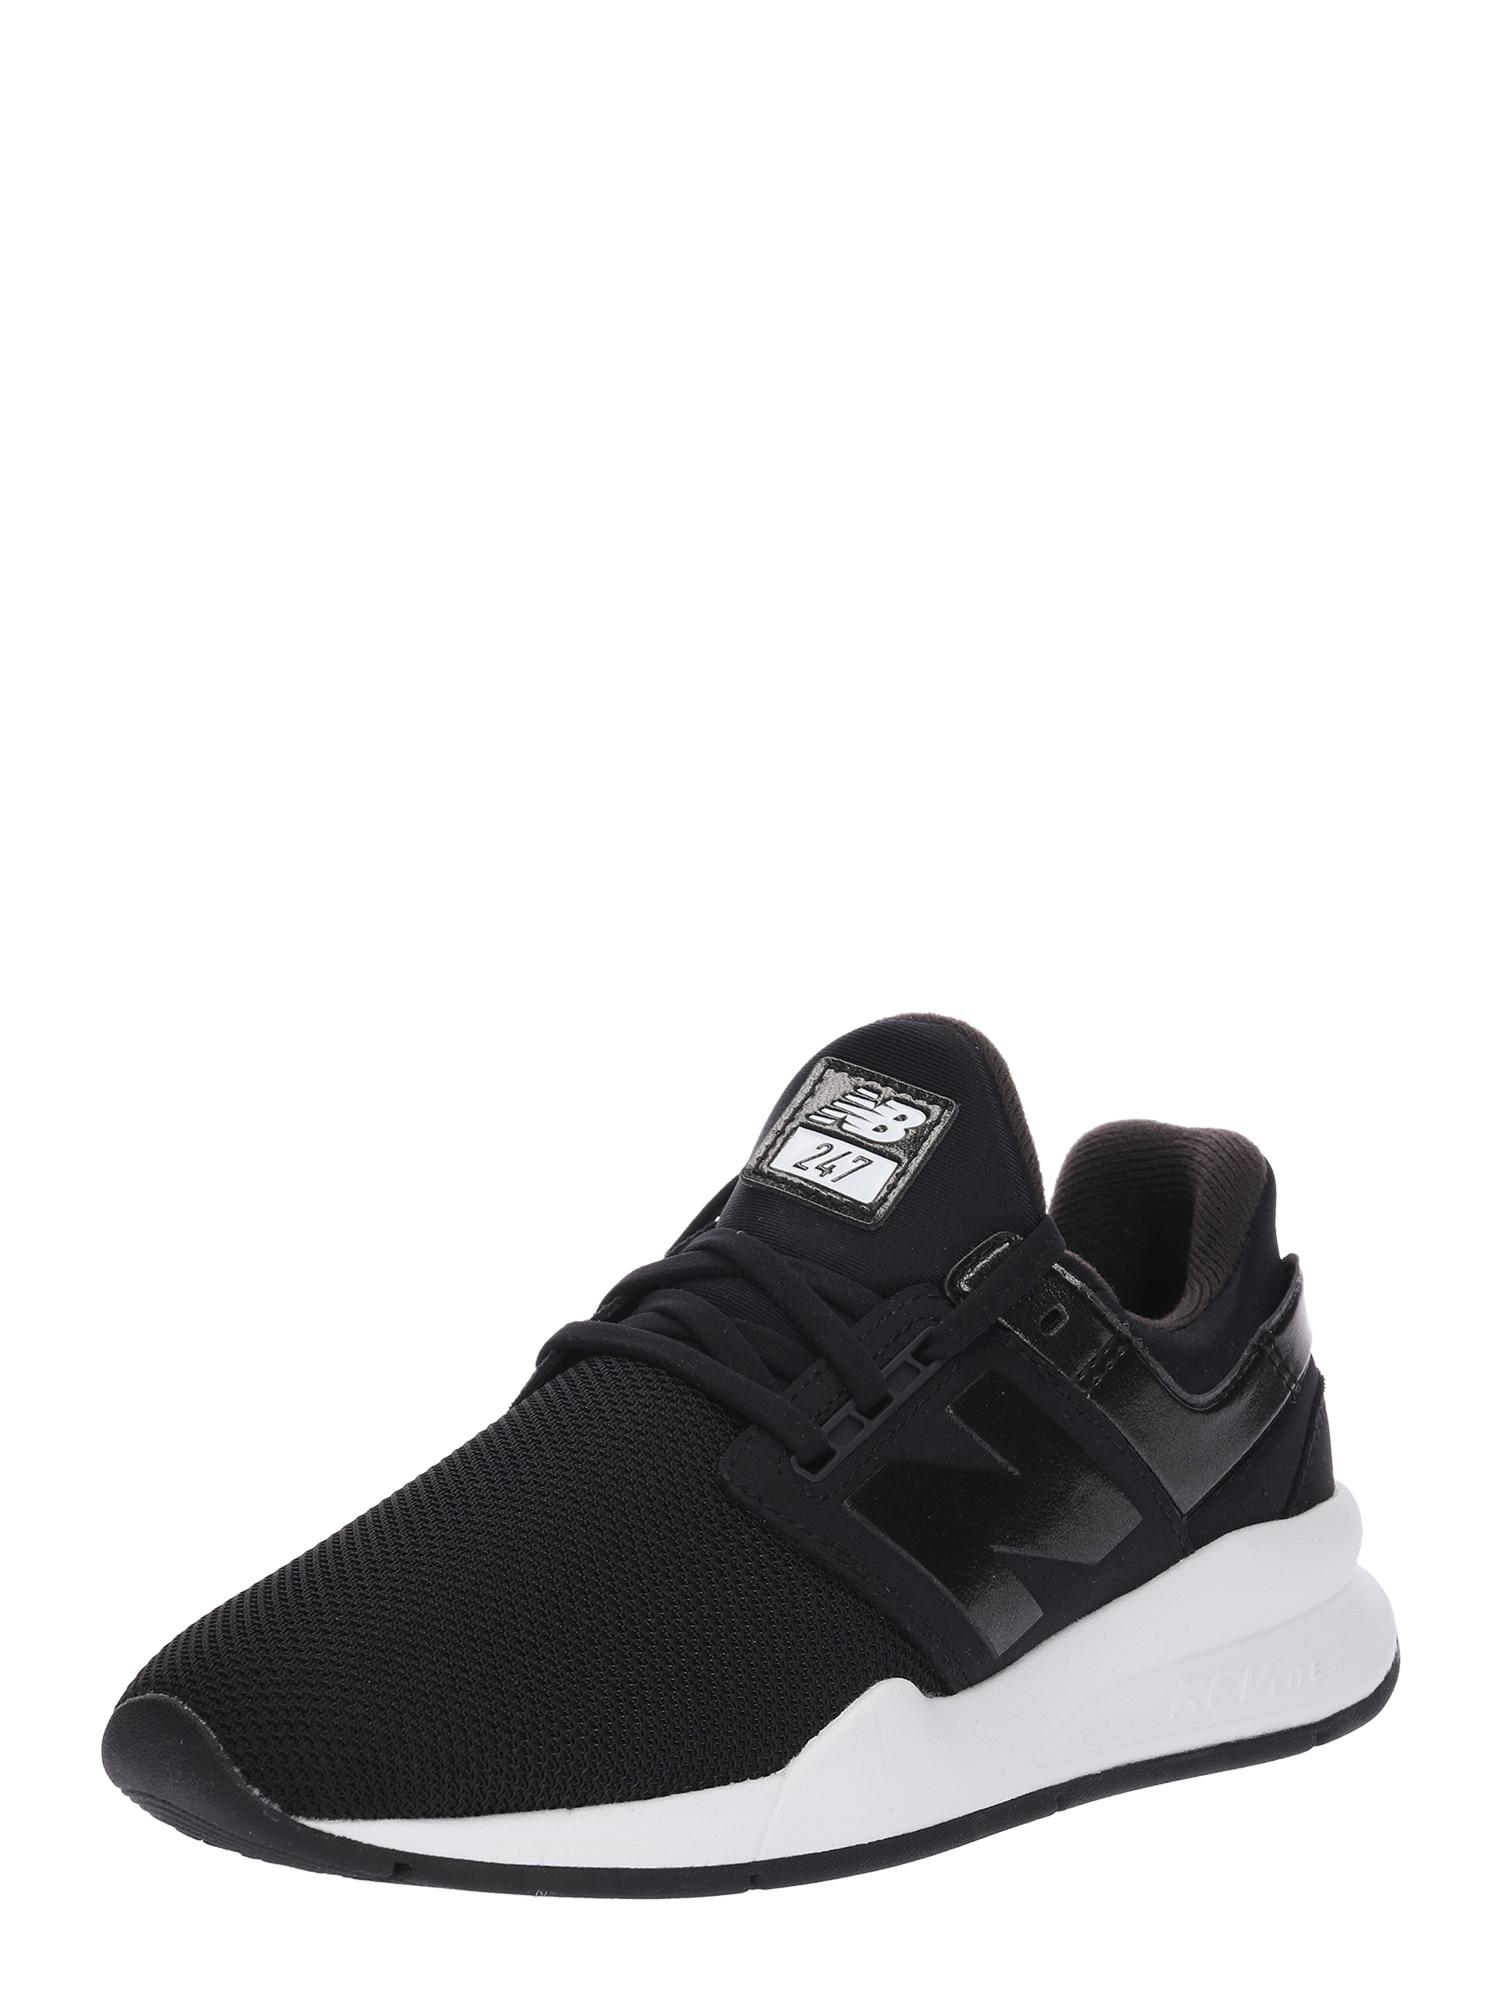 New Balance, Dames Sneakers laag 'WS247', zwart